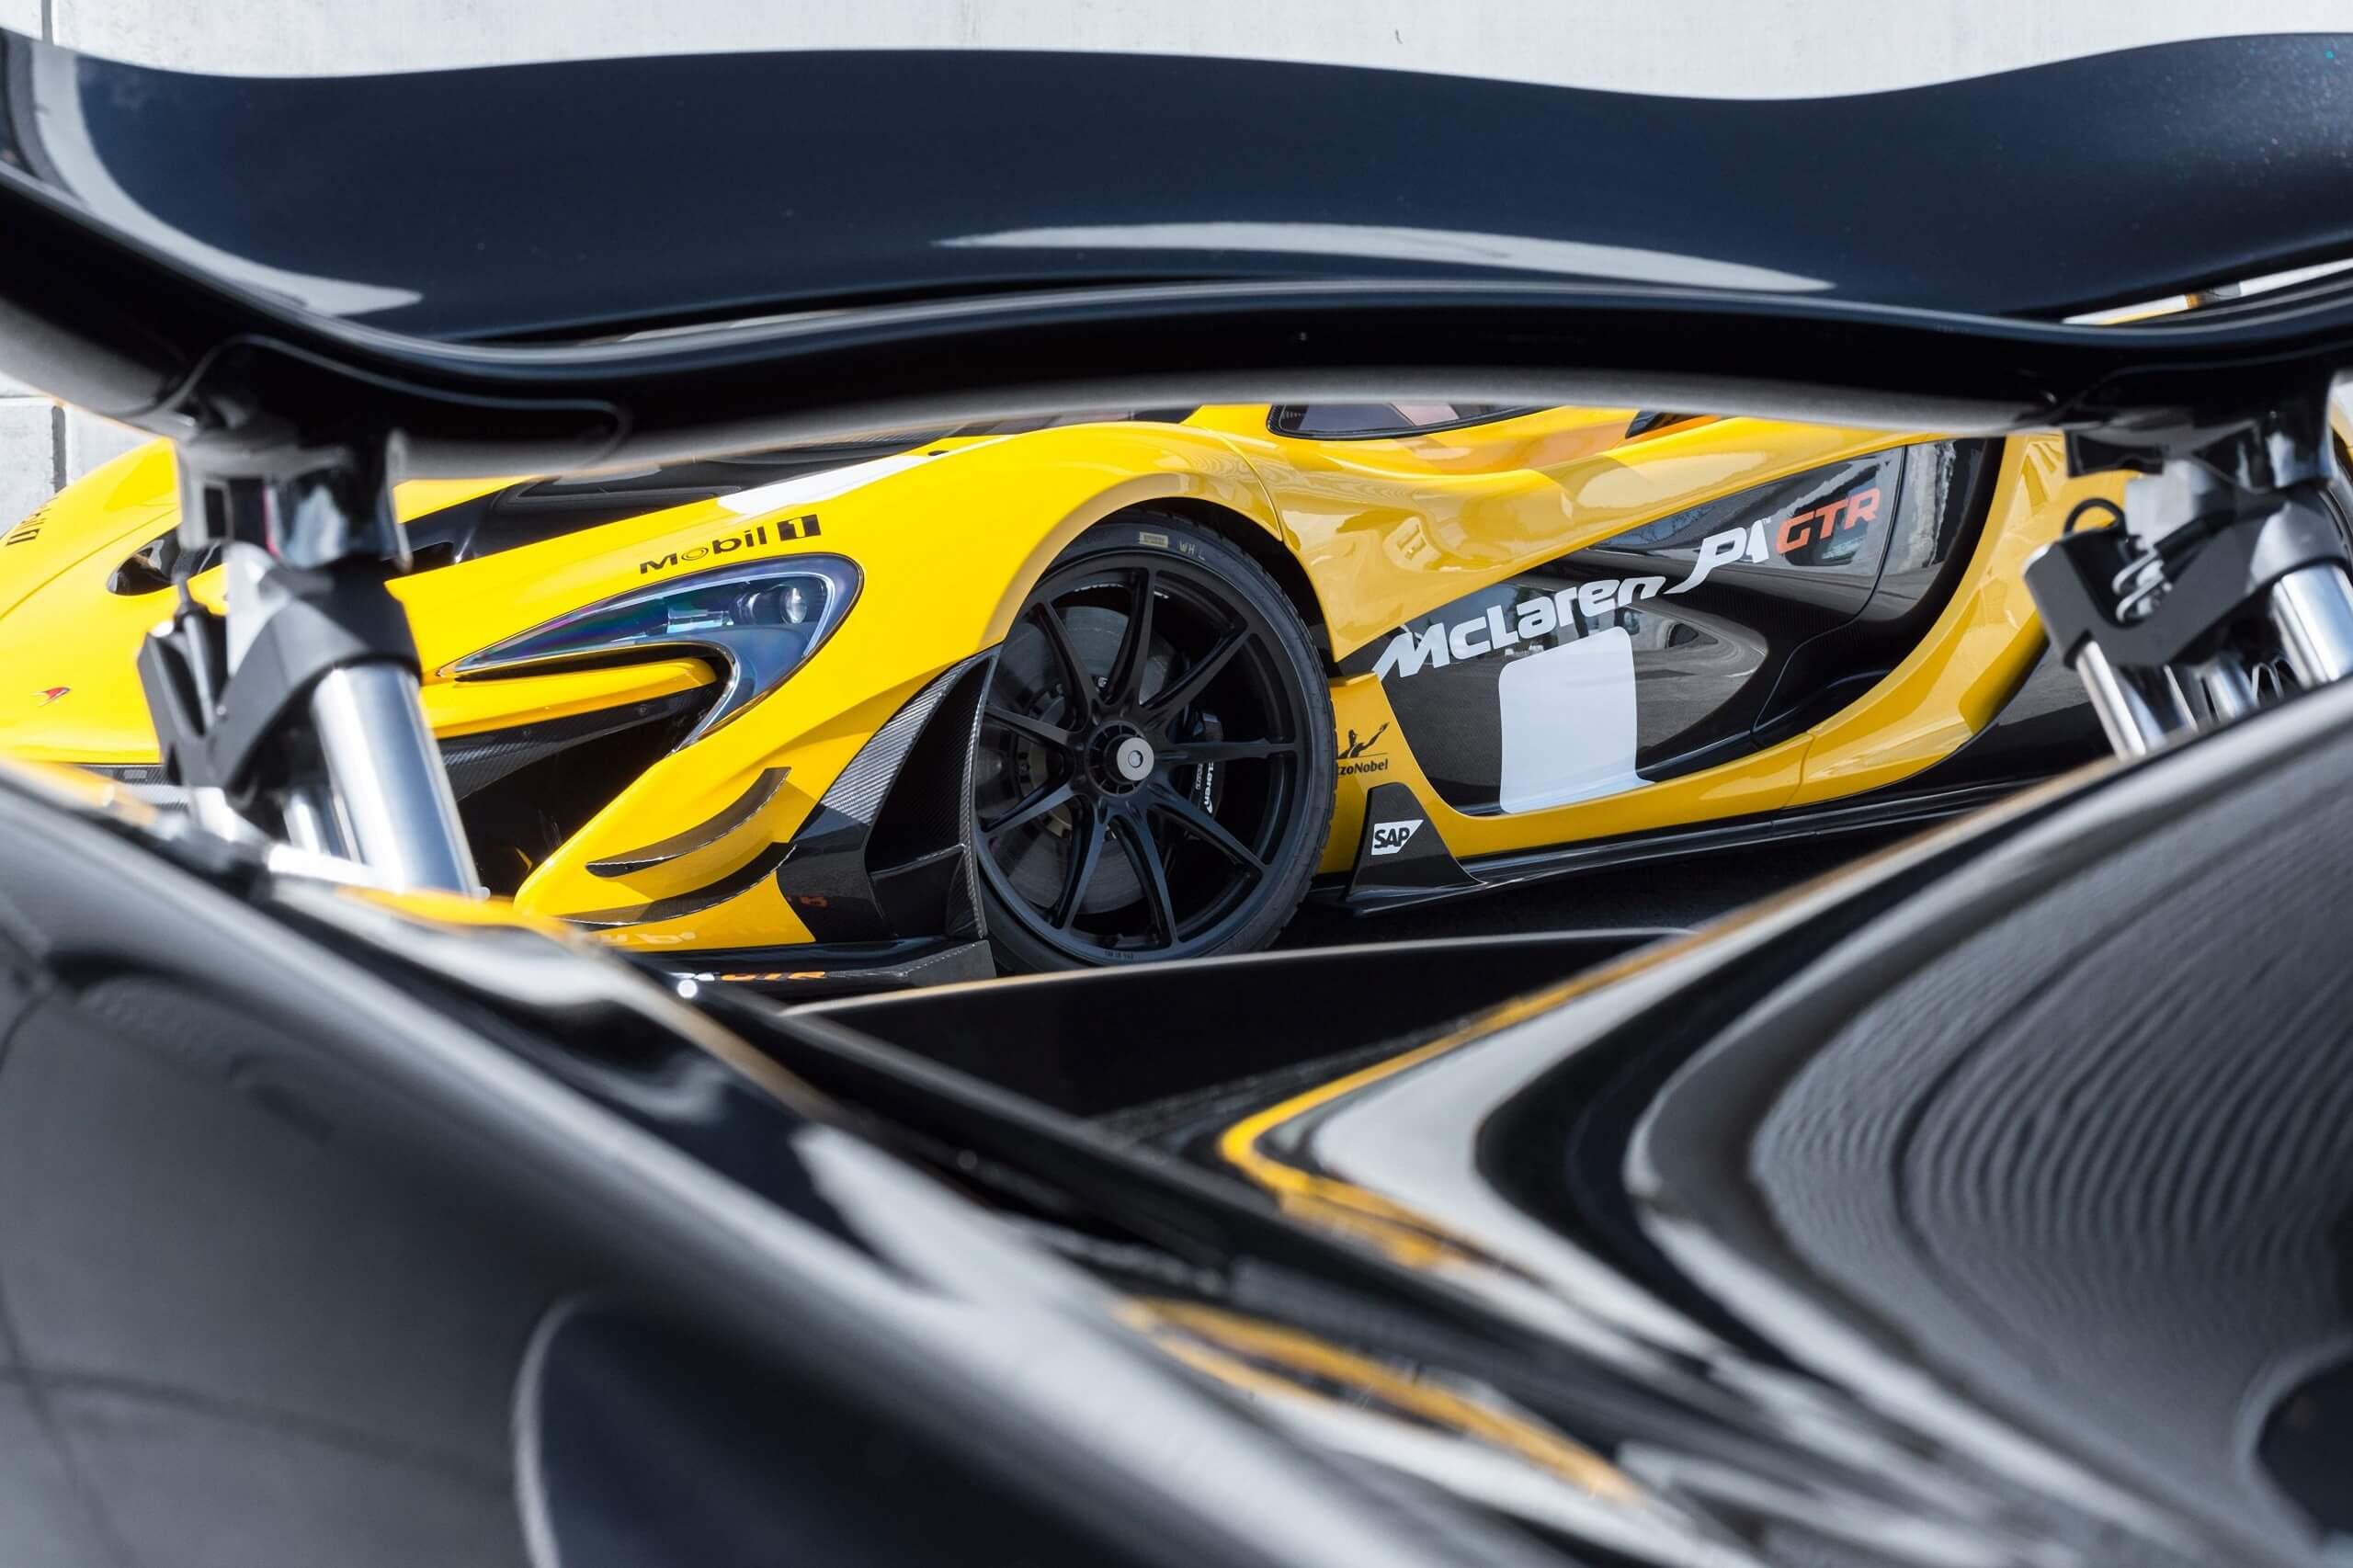 Street-legal-McLaren-P1-GTR-for-sale-20